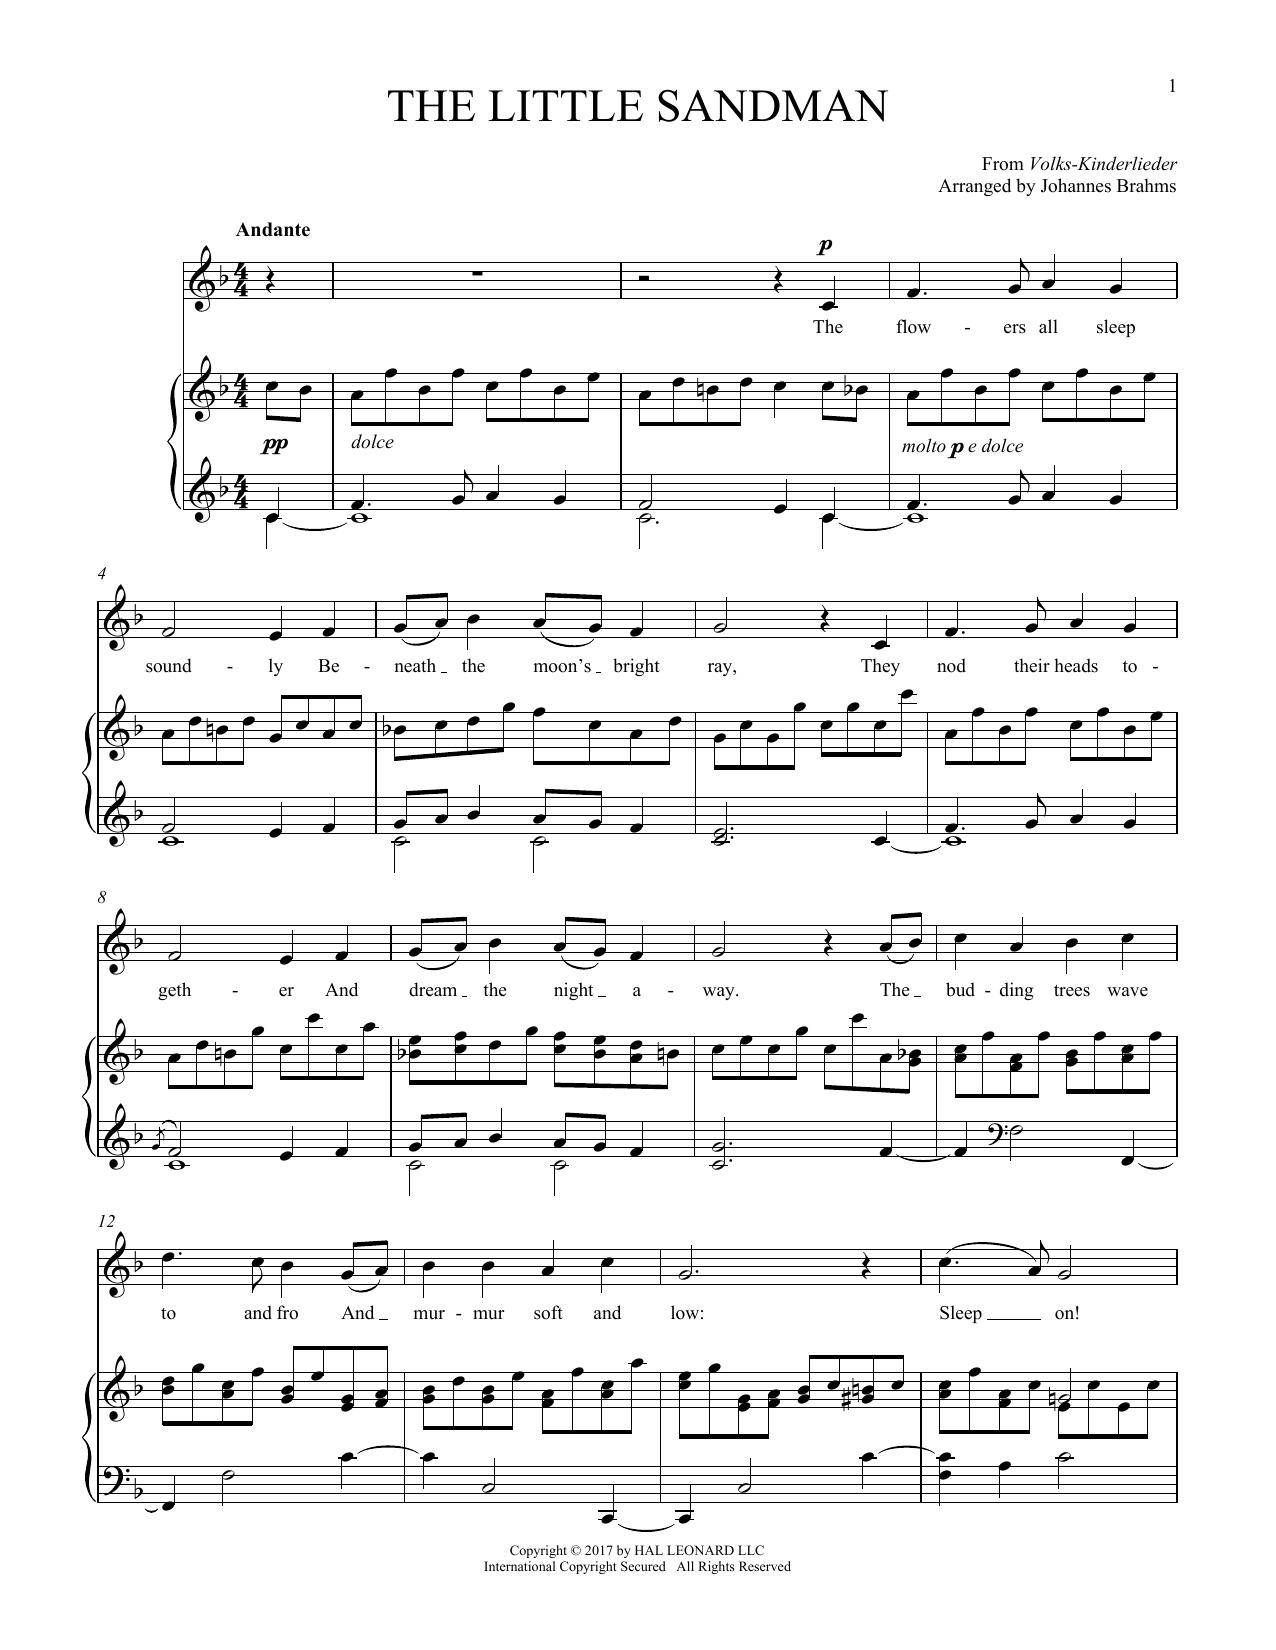 Johannes Brahms Sandmannchen (The Little Sandman), WoO 31, No. 4 sheet music notes and chords. Download Printable PDF.